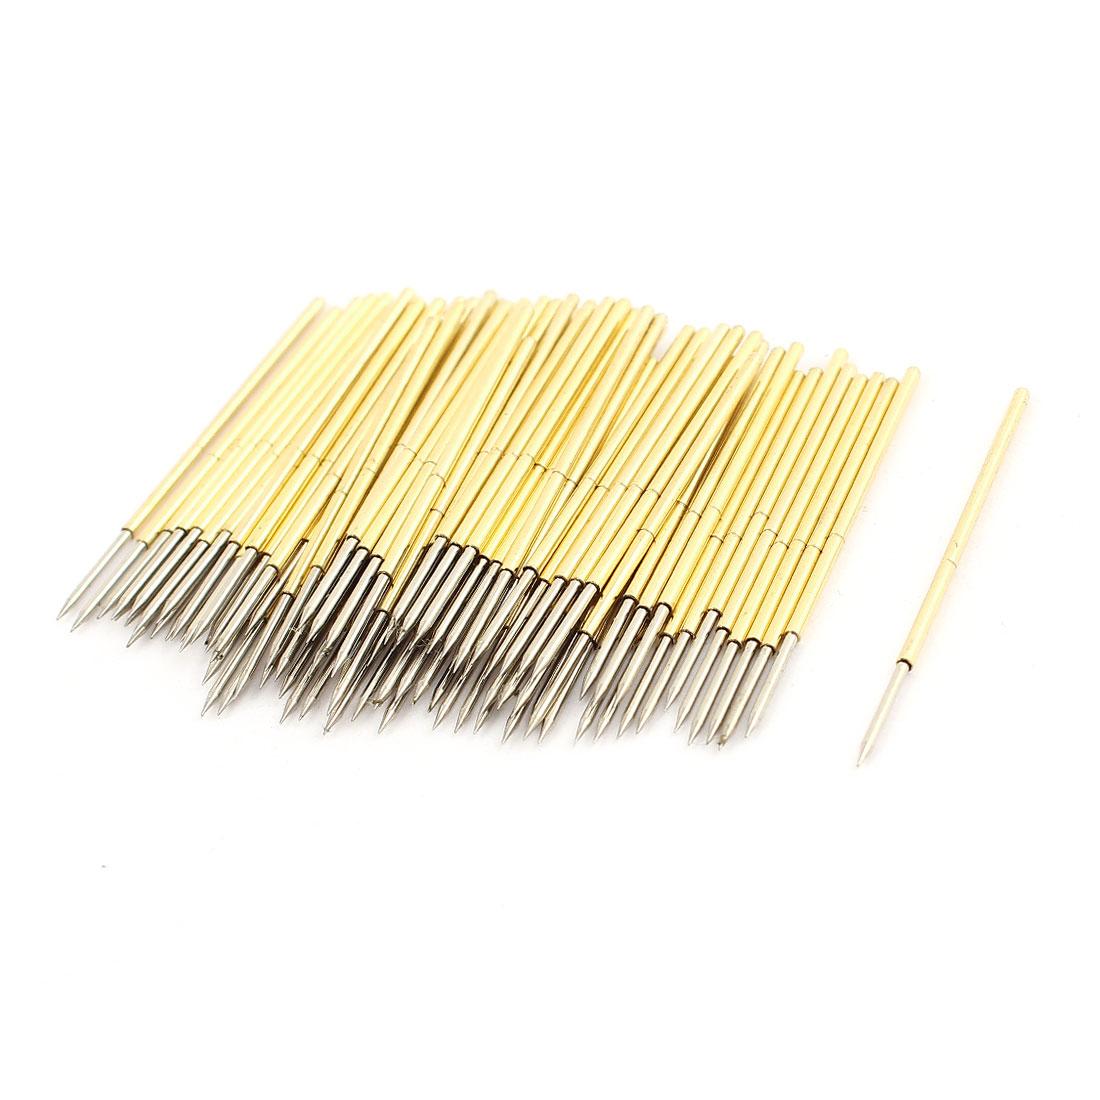 100 Pieces PL75-B1 Dia 1.02mm 120g Pressure Spring Test Probe Pin